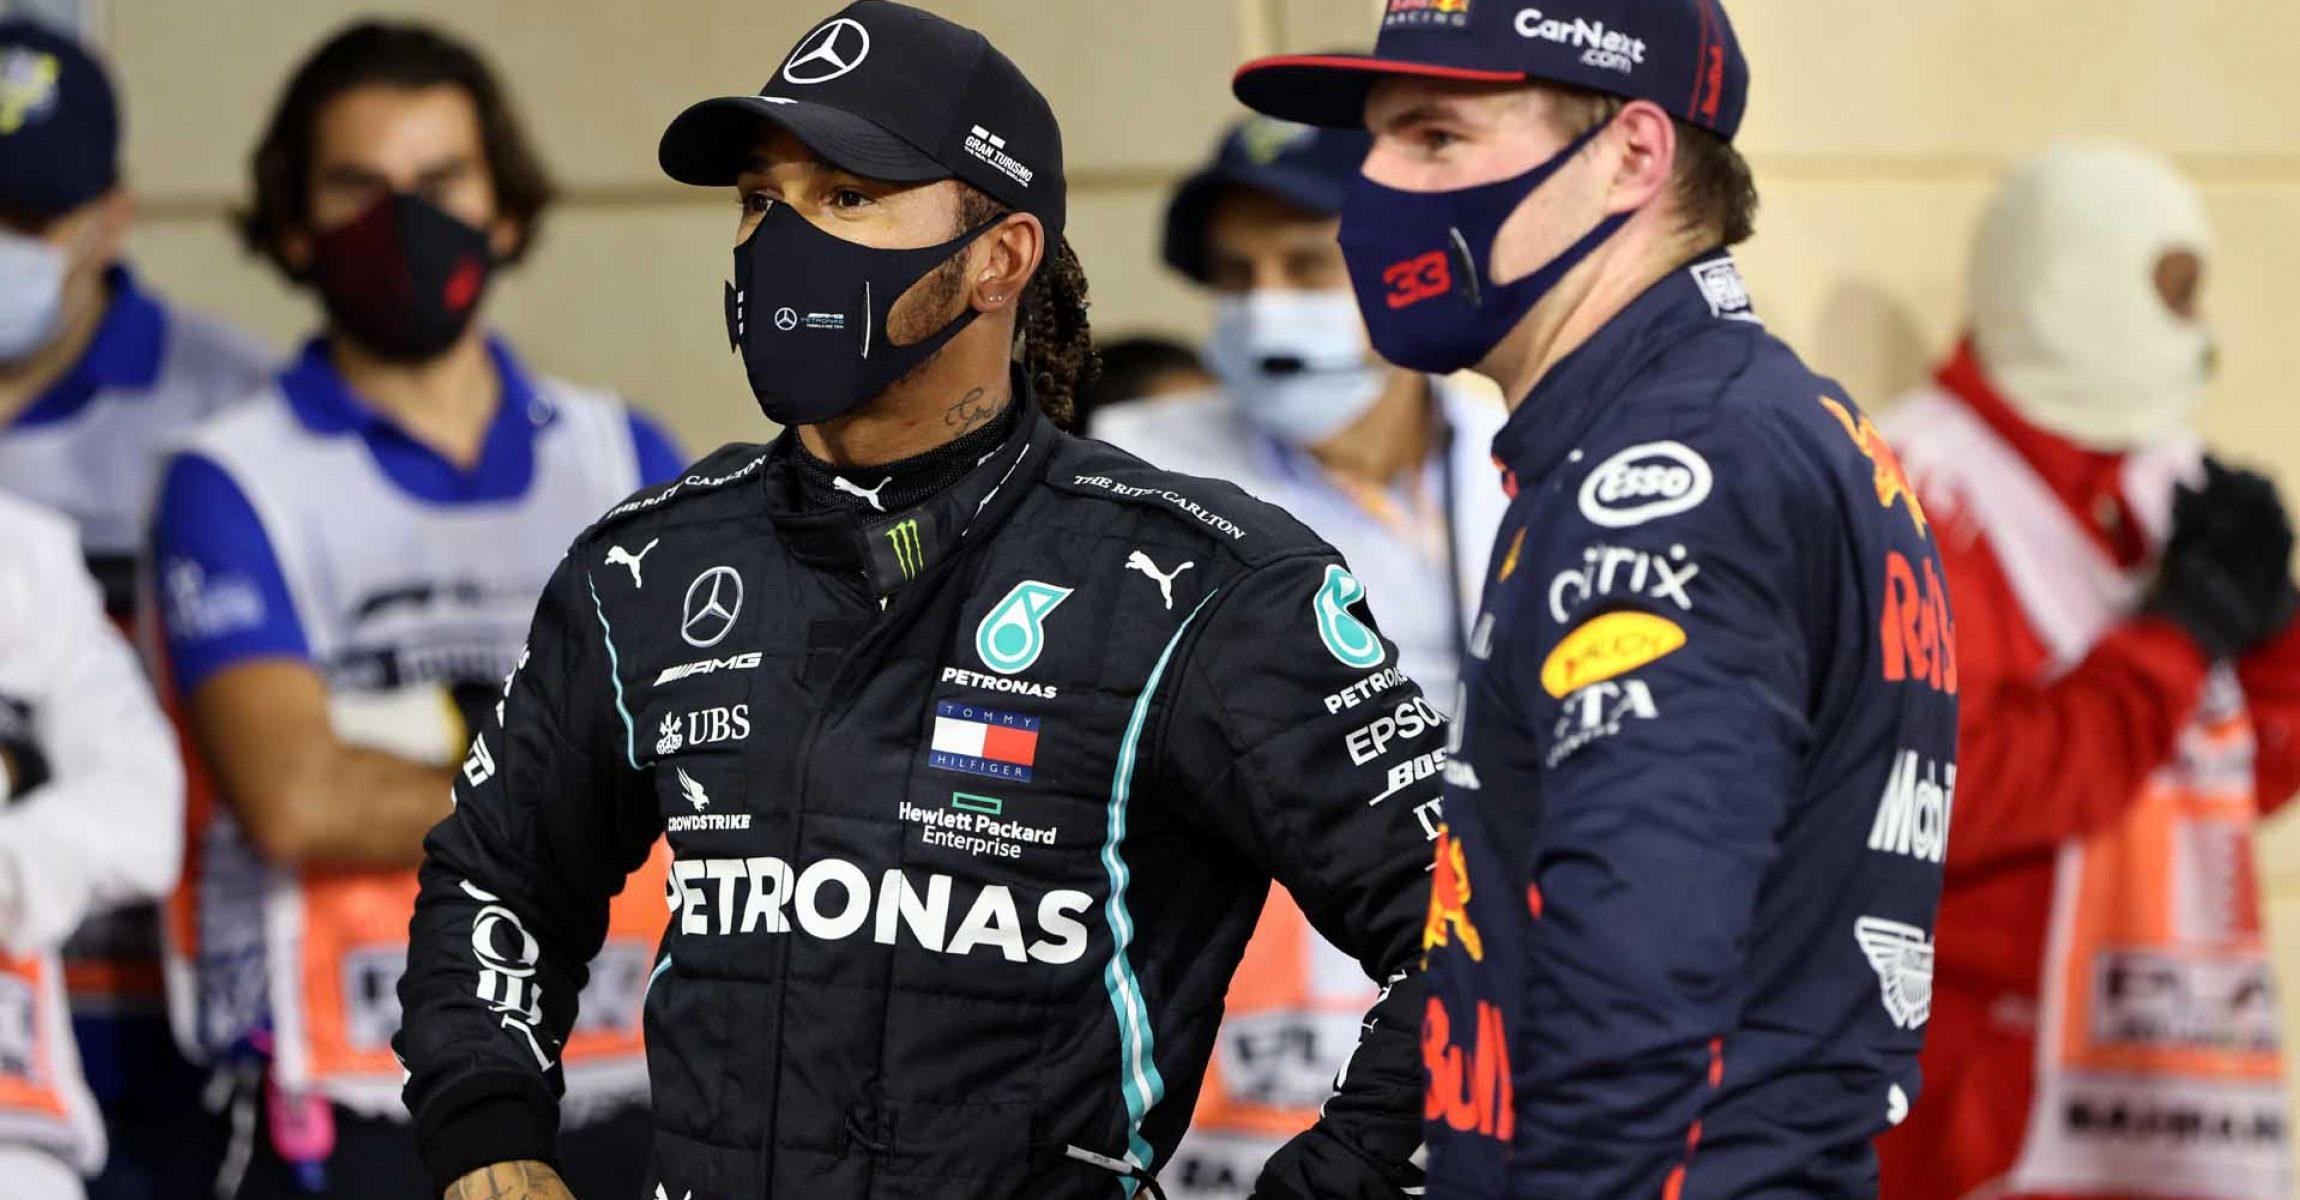 2020 Bahrain Grand Prix, Saturday - Steve Etherington Lewis Hamilton Mercedes Max Verstappen Red Bull